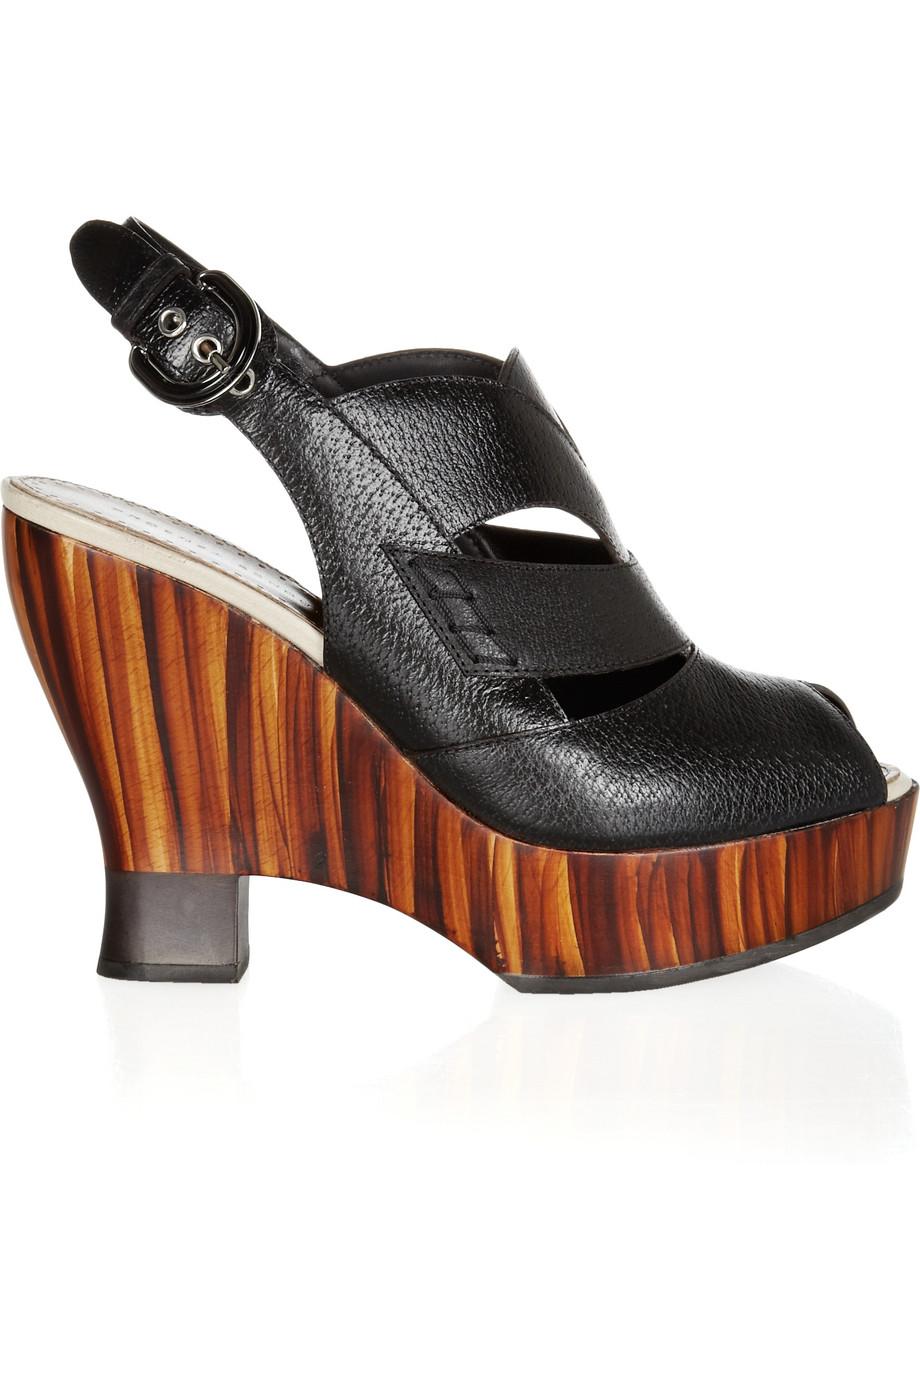 Proenza Schouler Cutout Wedge Sandals visit for sale cheap sale real sale shop cheap latest collections cheap 2015 doxXC